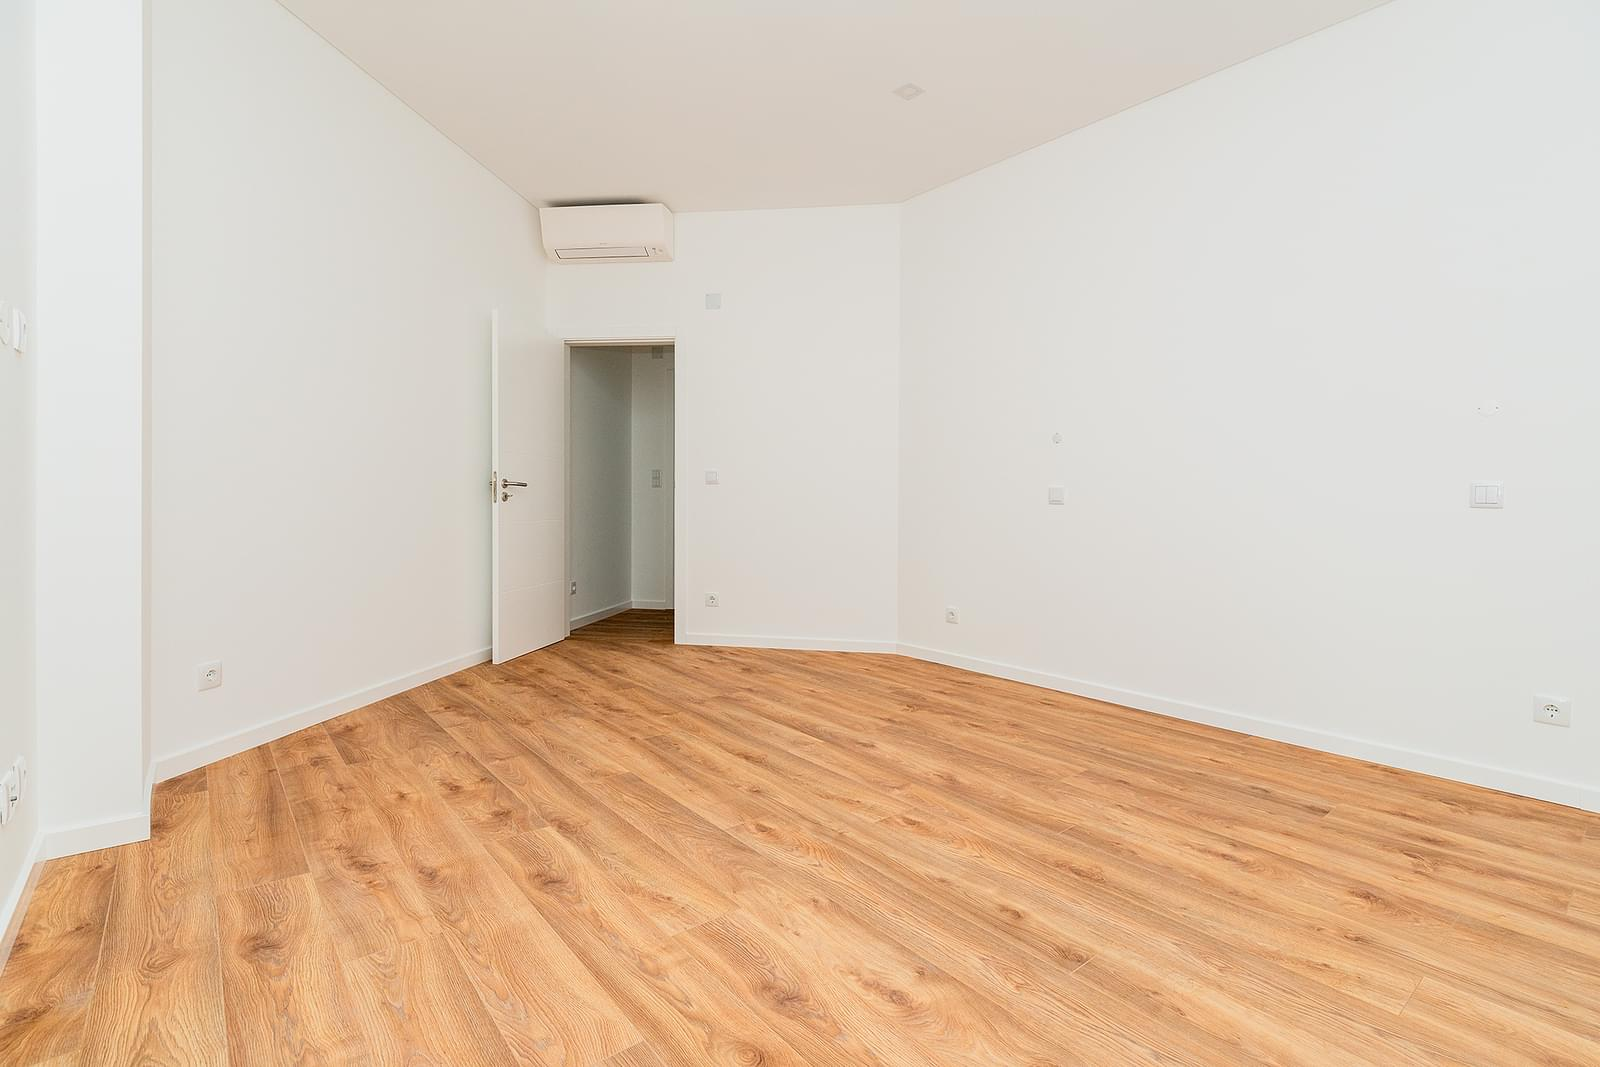 pf18413-apartamento-t1-lisboa-fab00dbc-8f82-4cc9-bf6a-ca0e1b8241e5